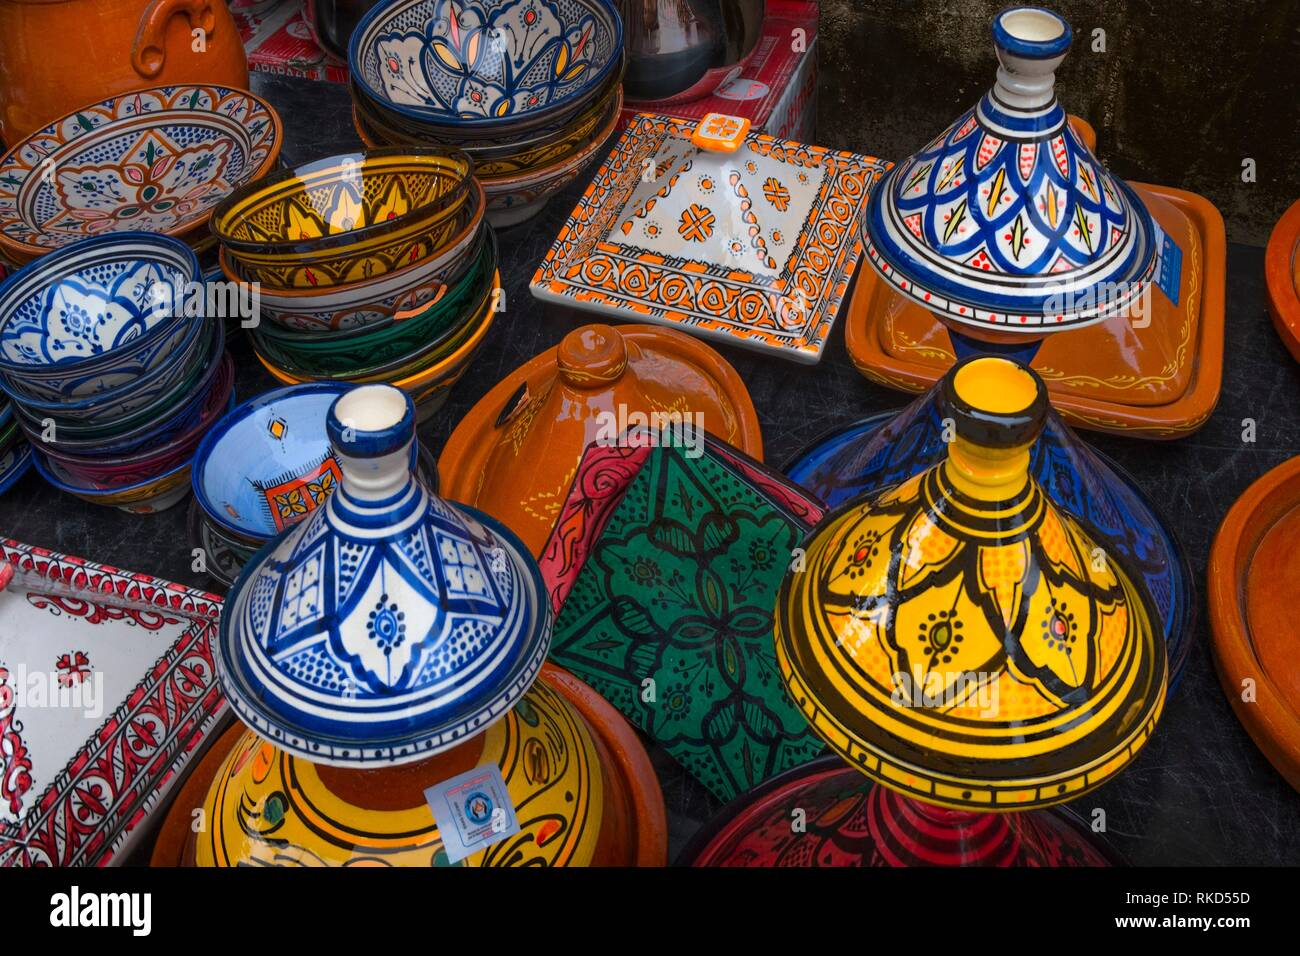 Morocco, Handicraft, Ceramics - Stock Image